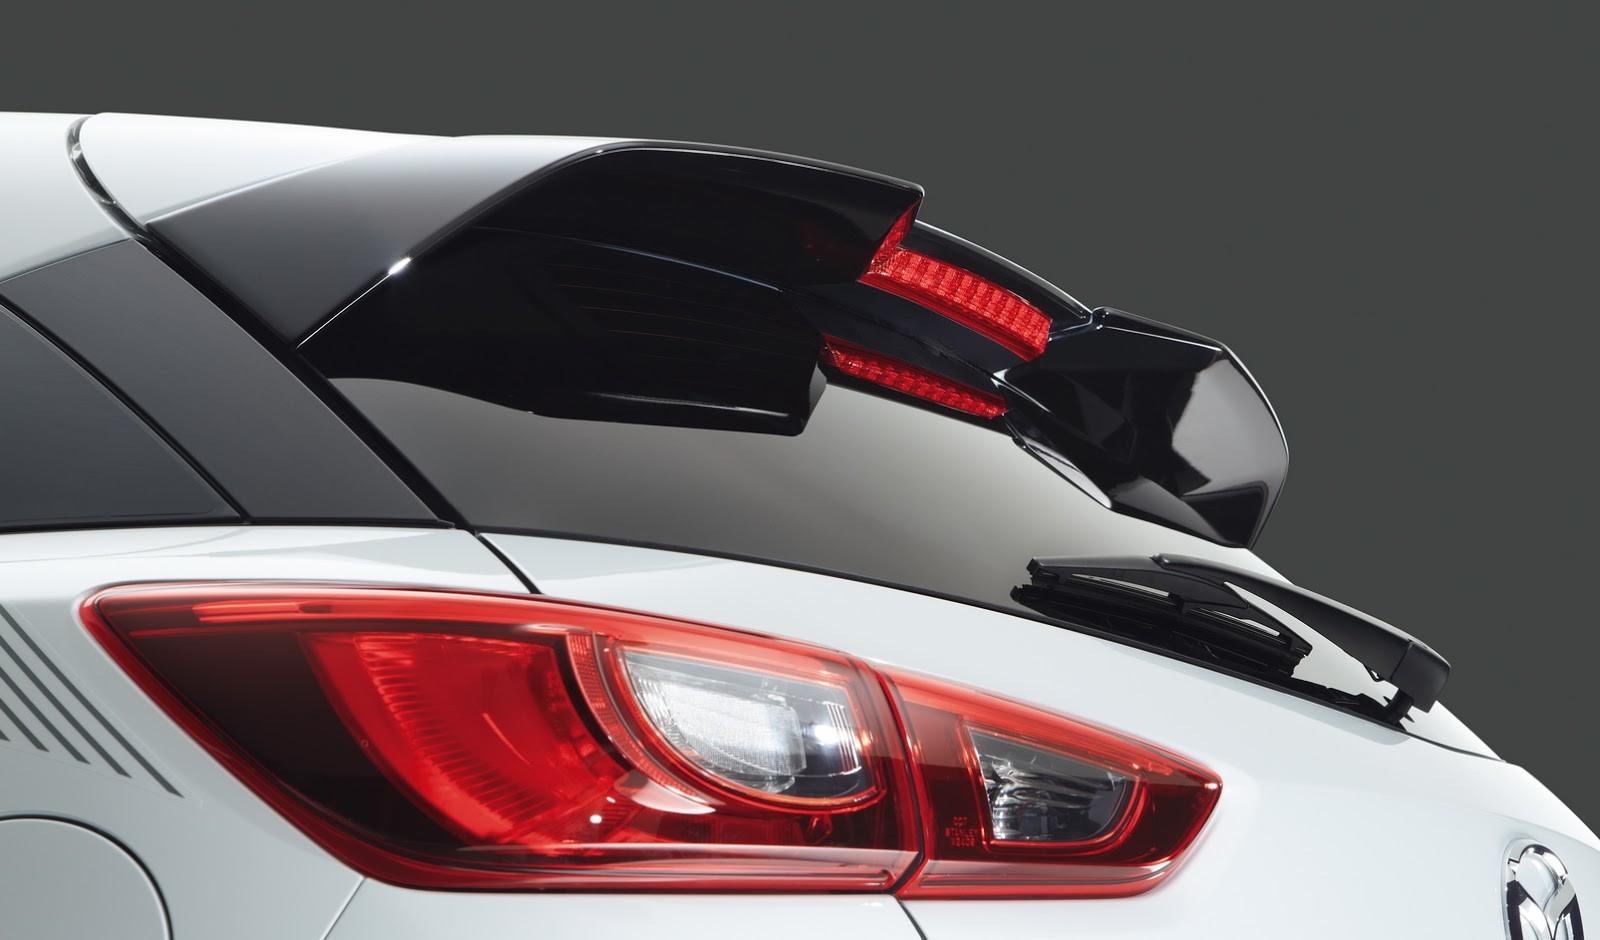 Foto de Accesorios para Mazda CX-3 - CX-5 (8/12)